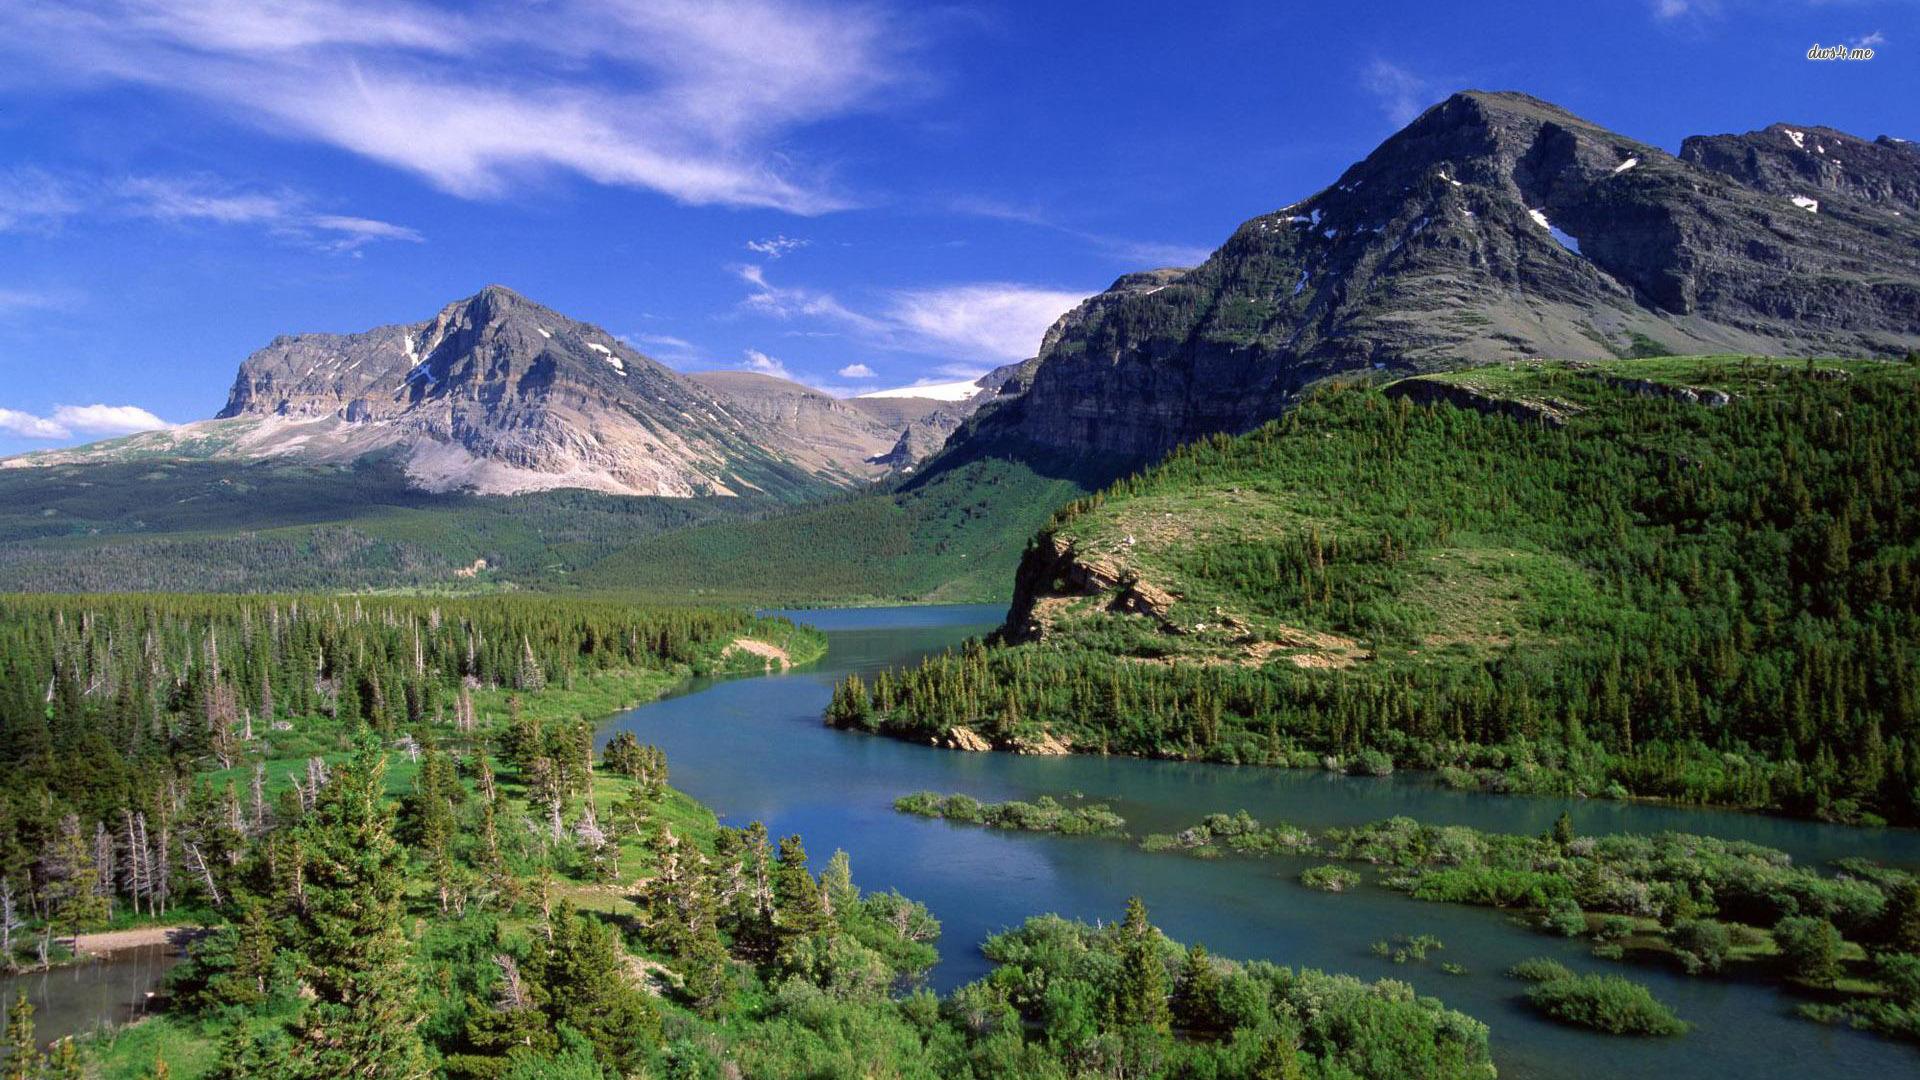 Mountain River wallpapers HD   260891 1920x1080